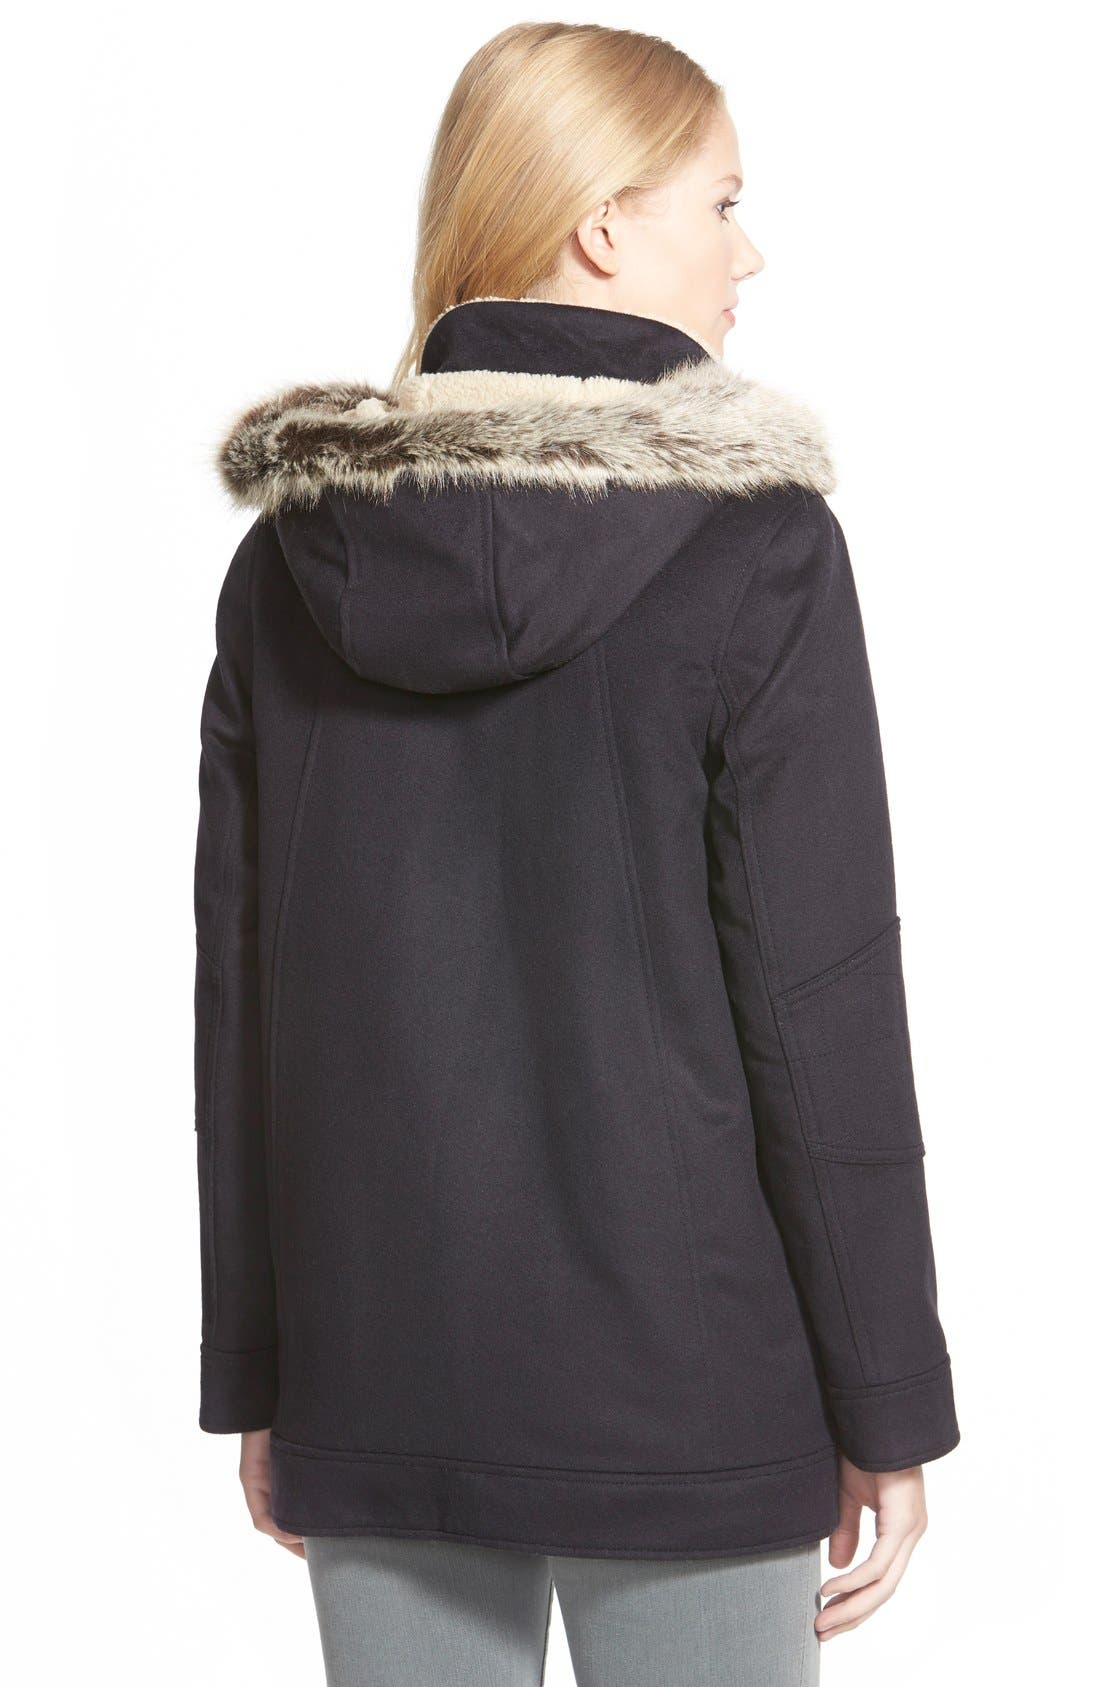 Alternate Image 2  - Barbour 'Carston' Faux Fur Trim Hooded Wool Blend Jacket